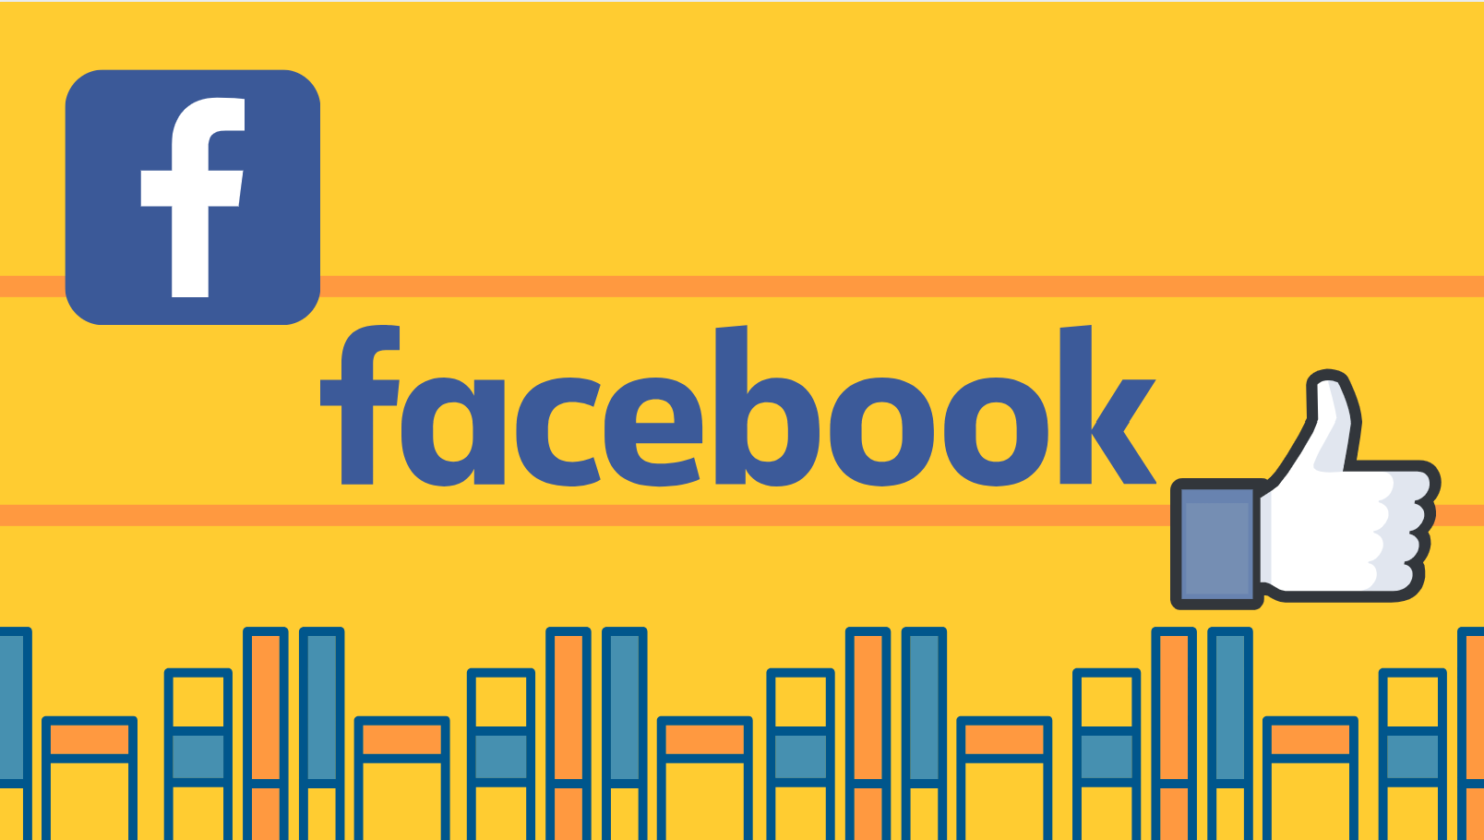 Facebook広告とは?費用・種類・特徴などFacebook広告に関する情報をご紹介!